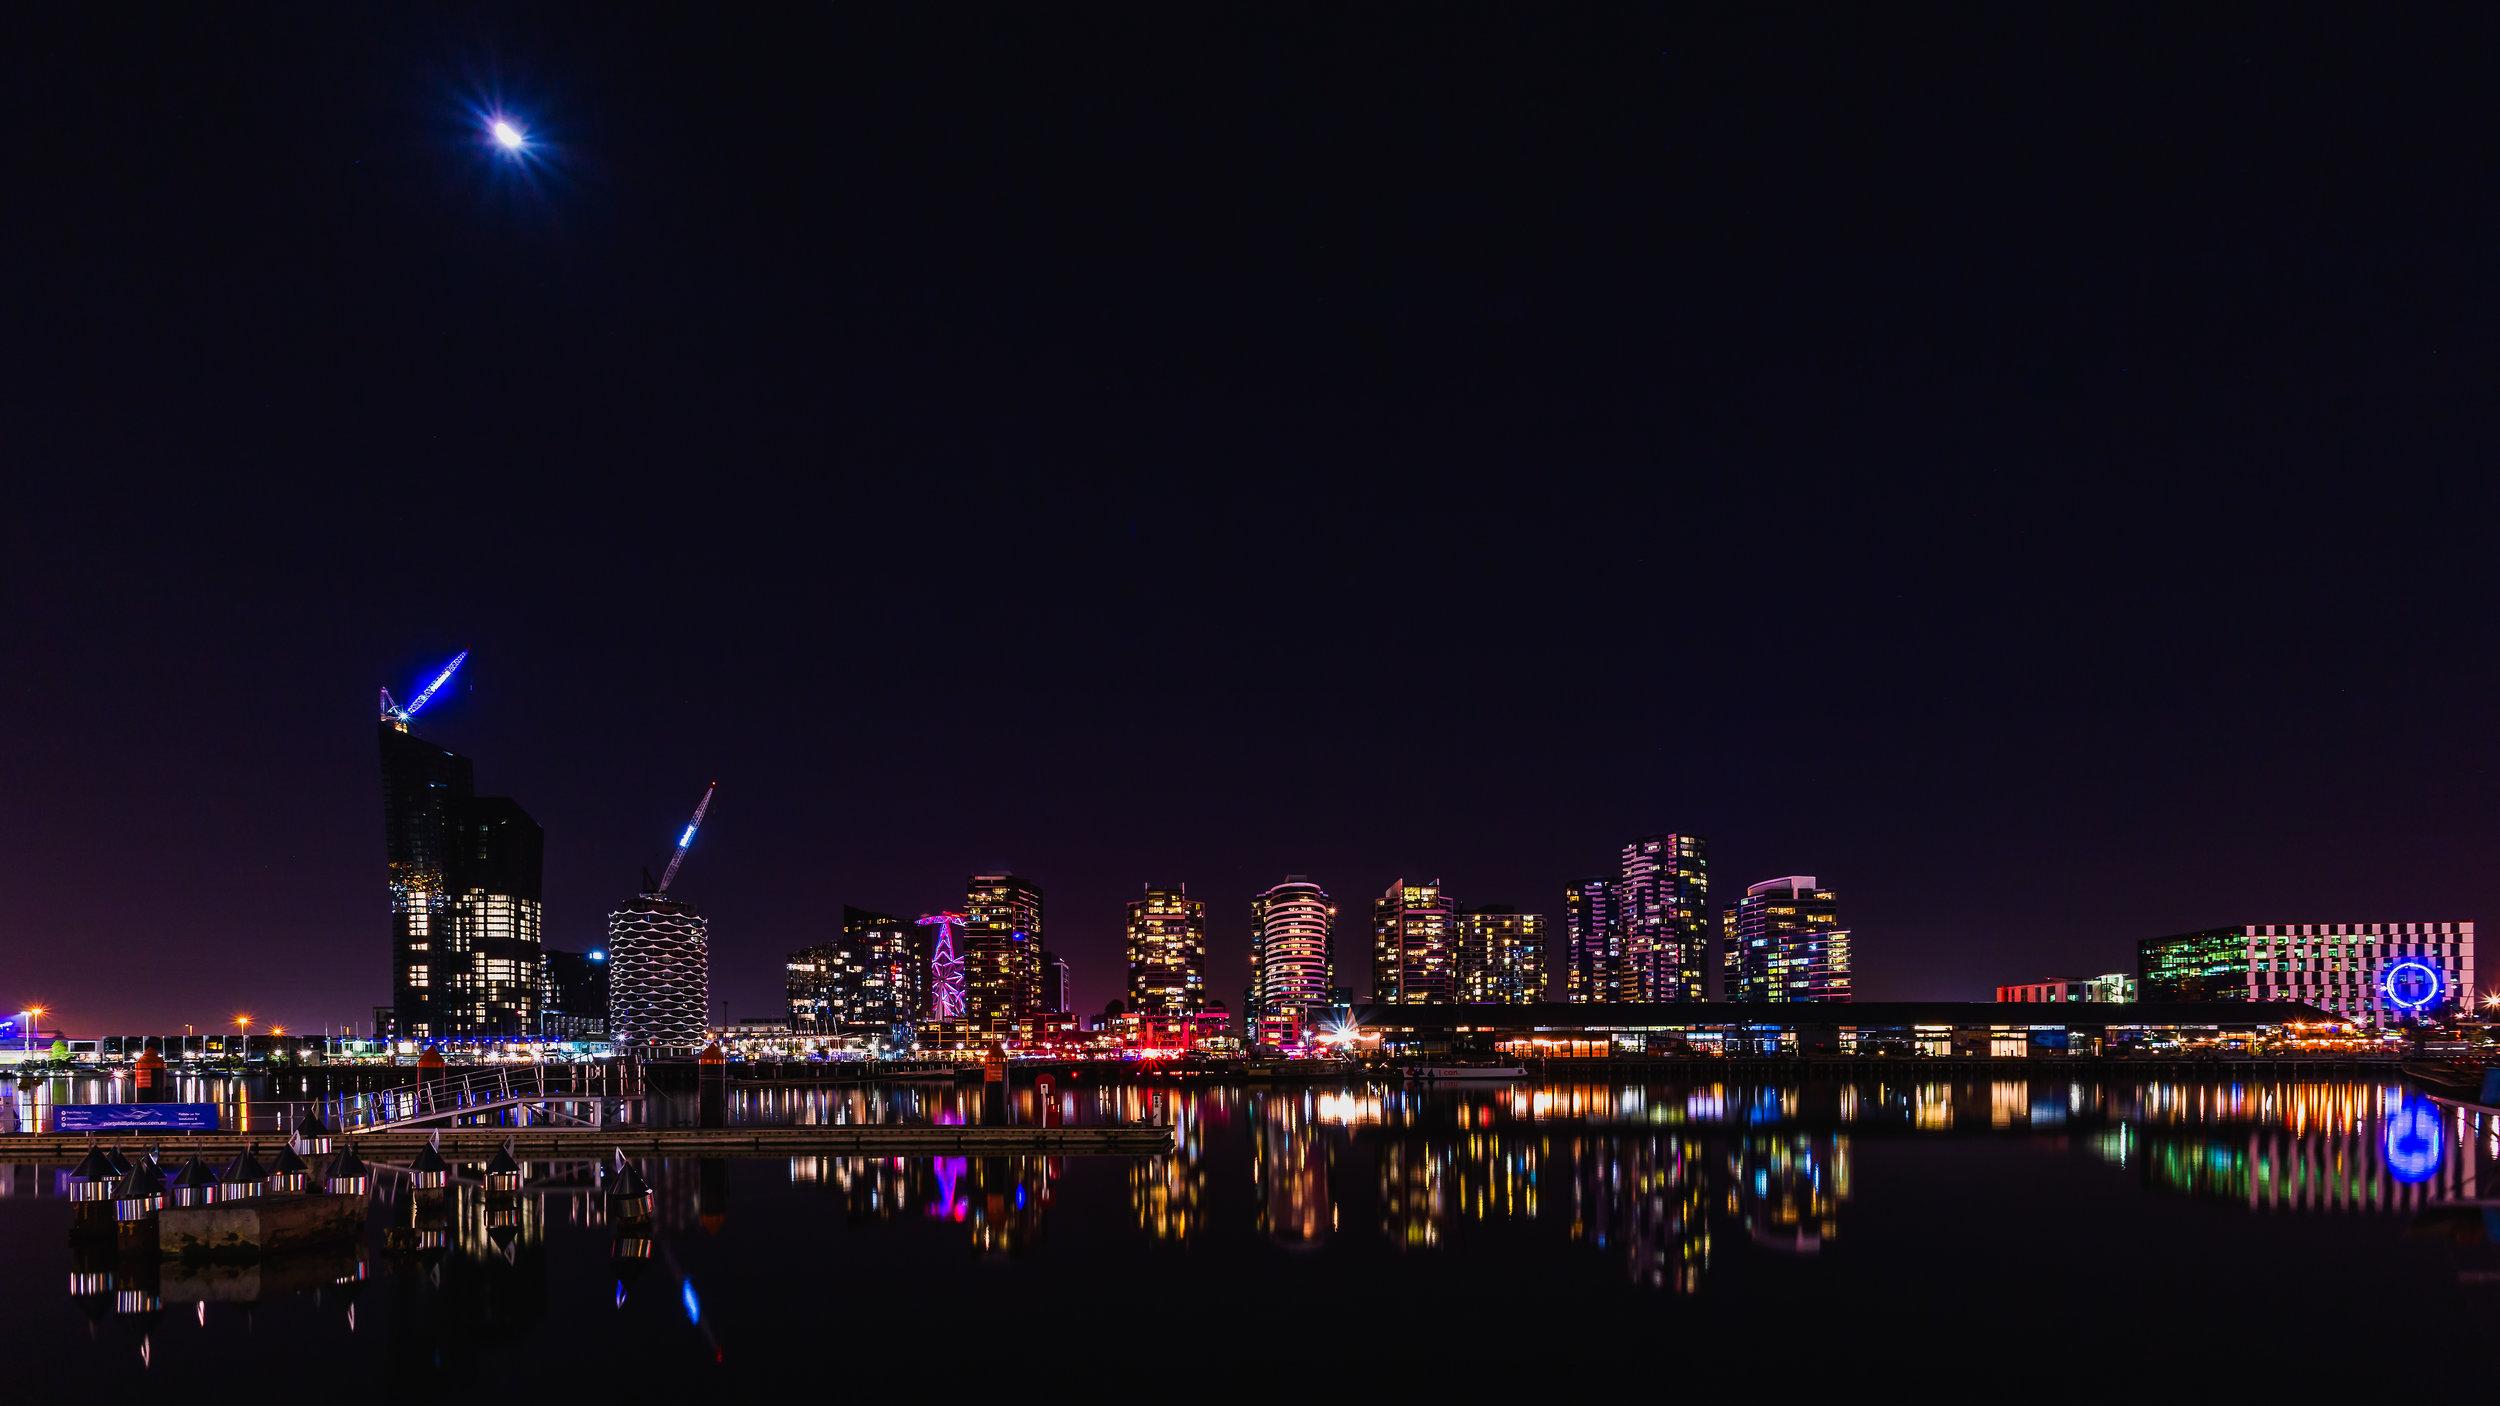 Docklands at night